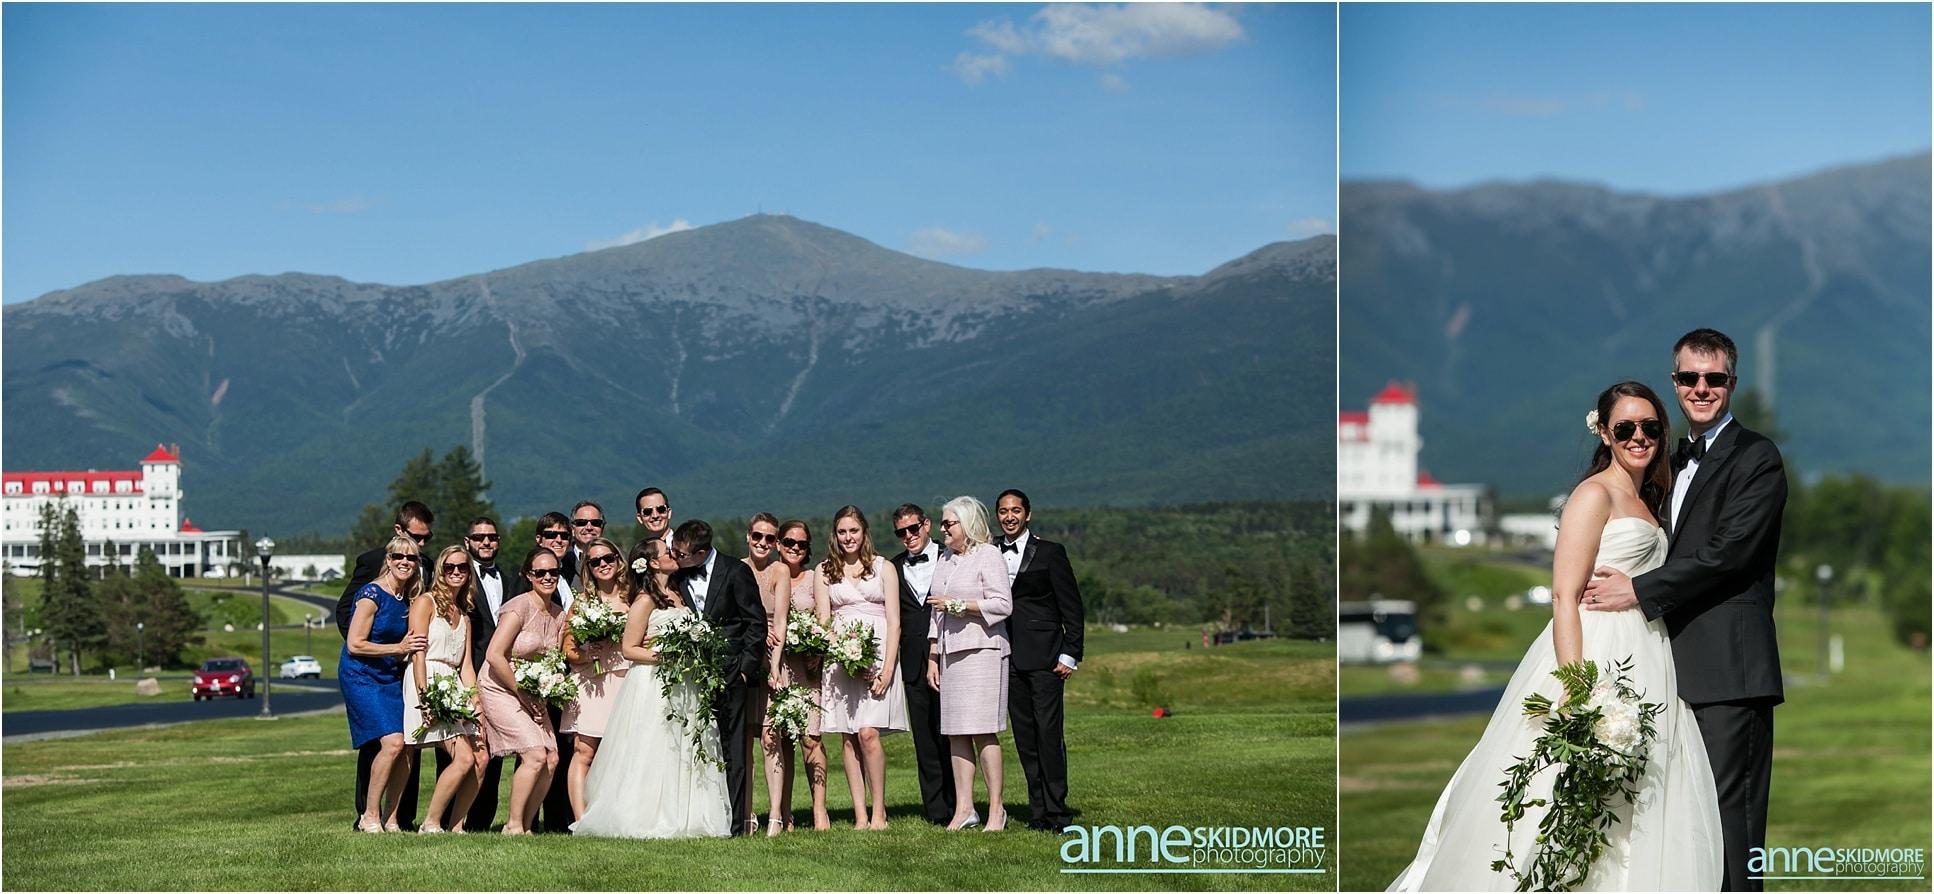 Omni_Mount_Washington_Wedding_0033